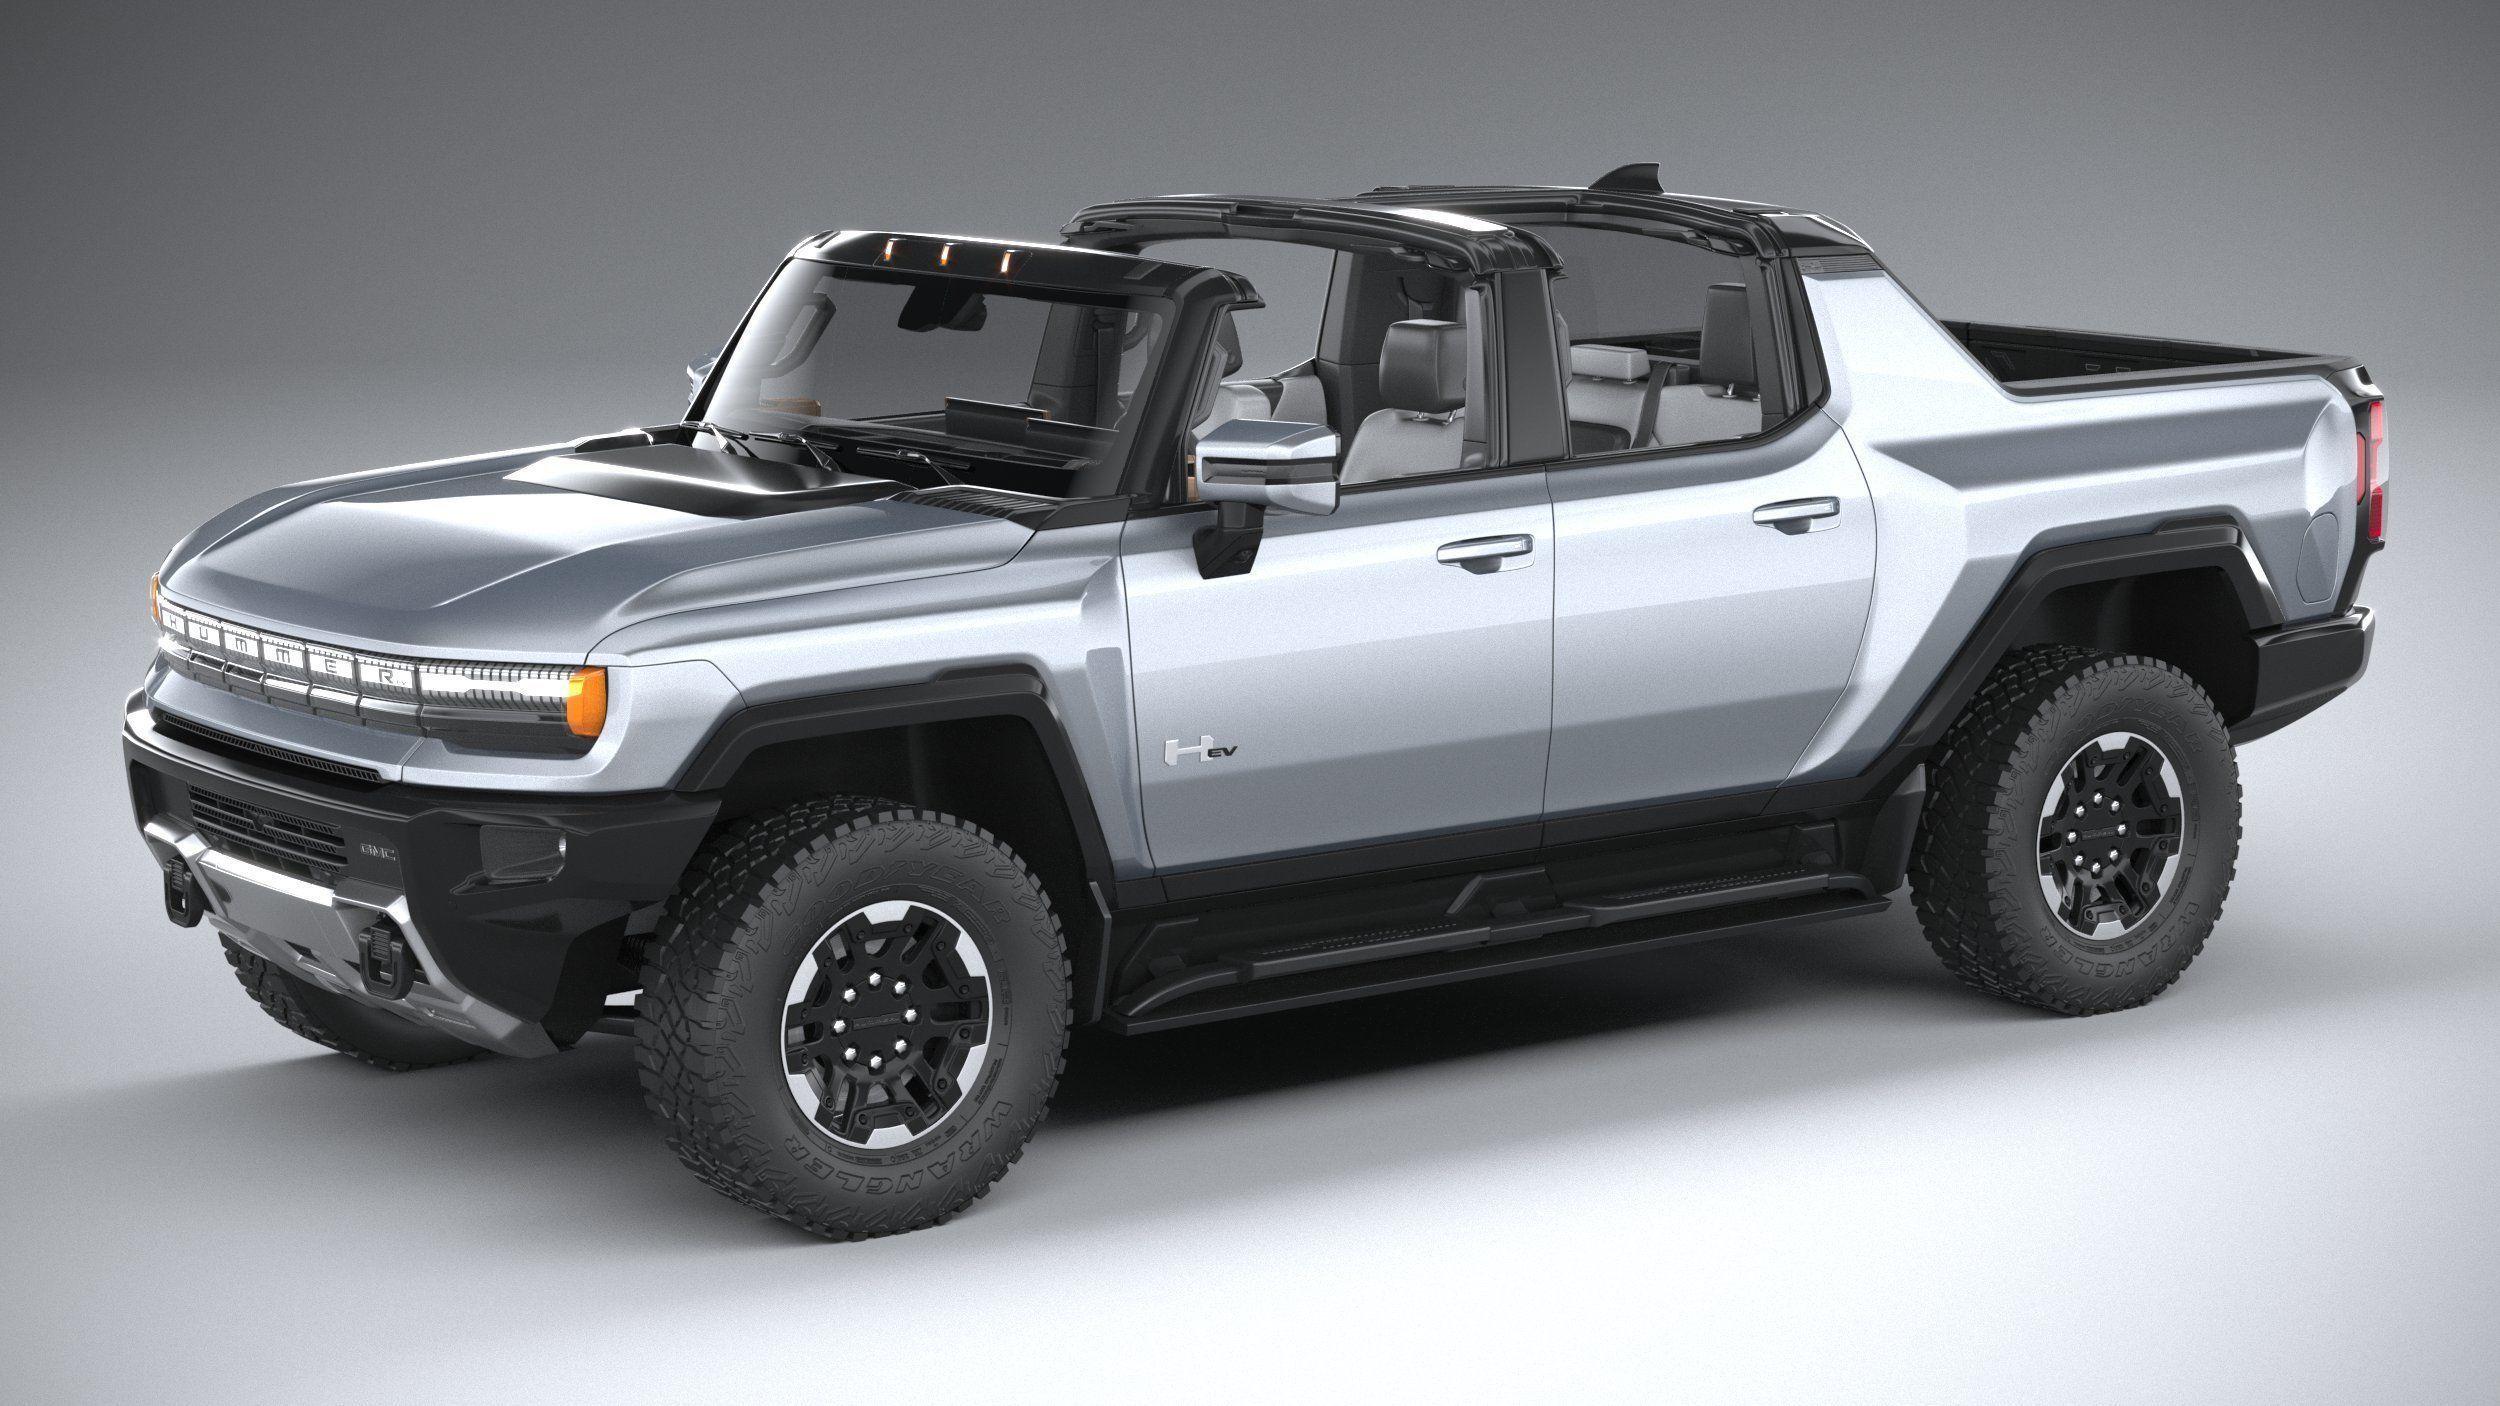 Hummer EV 2022 with interior